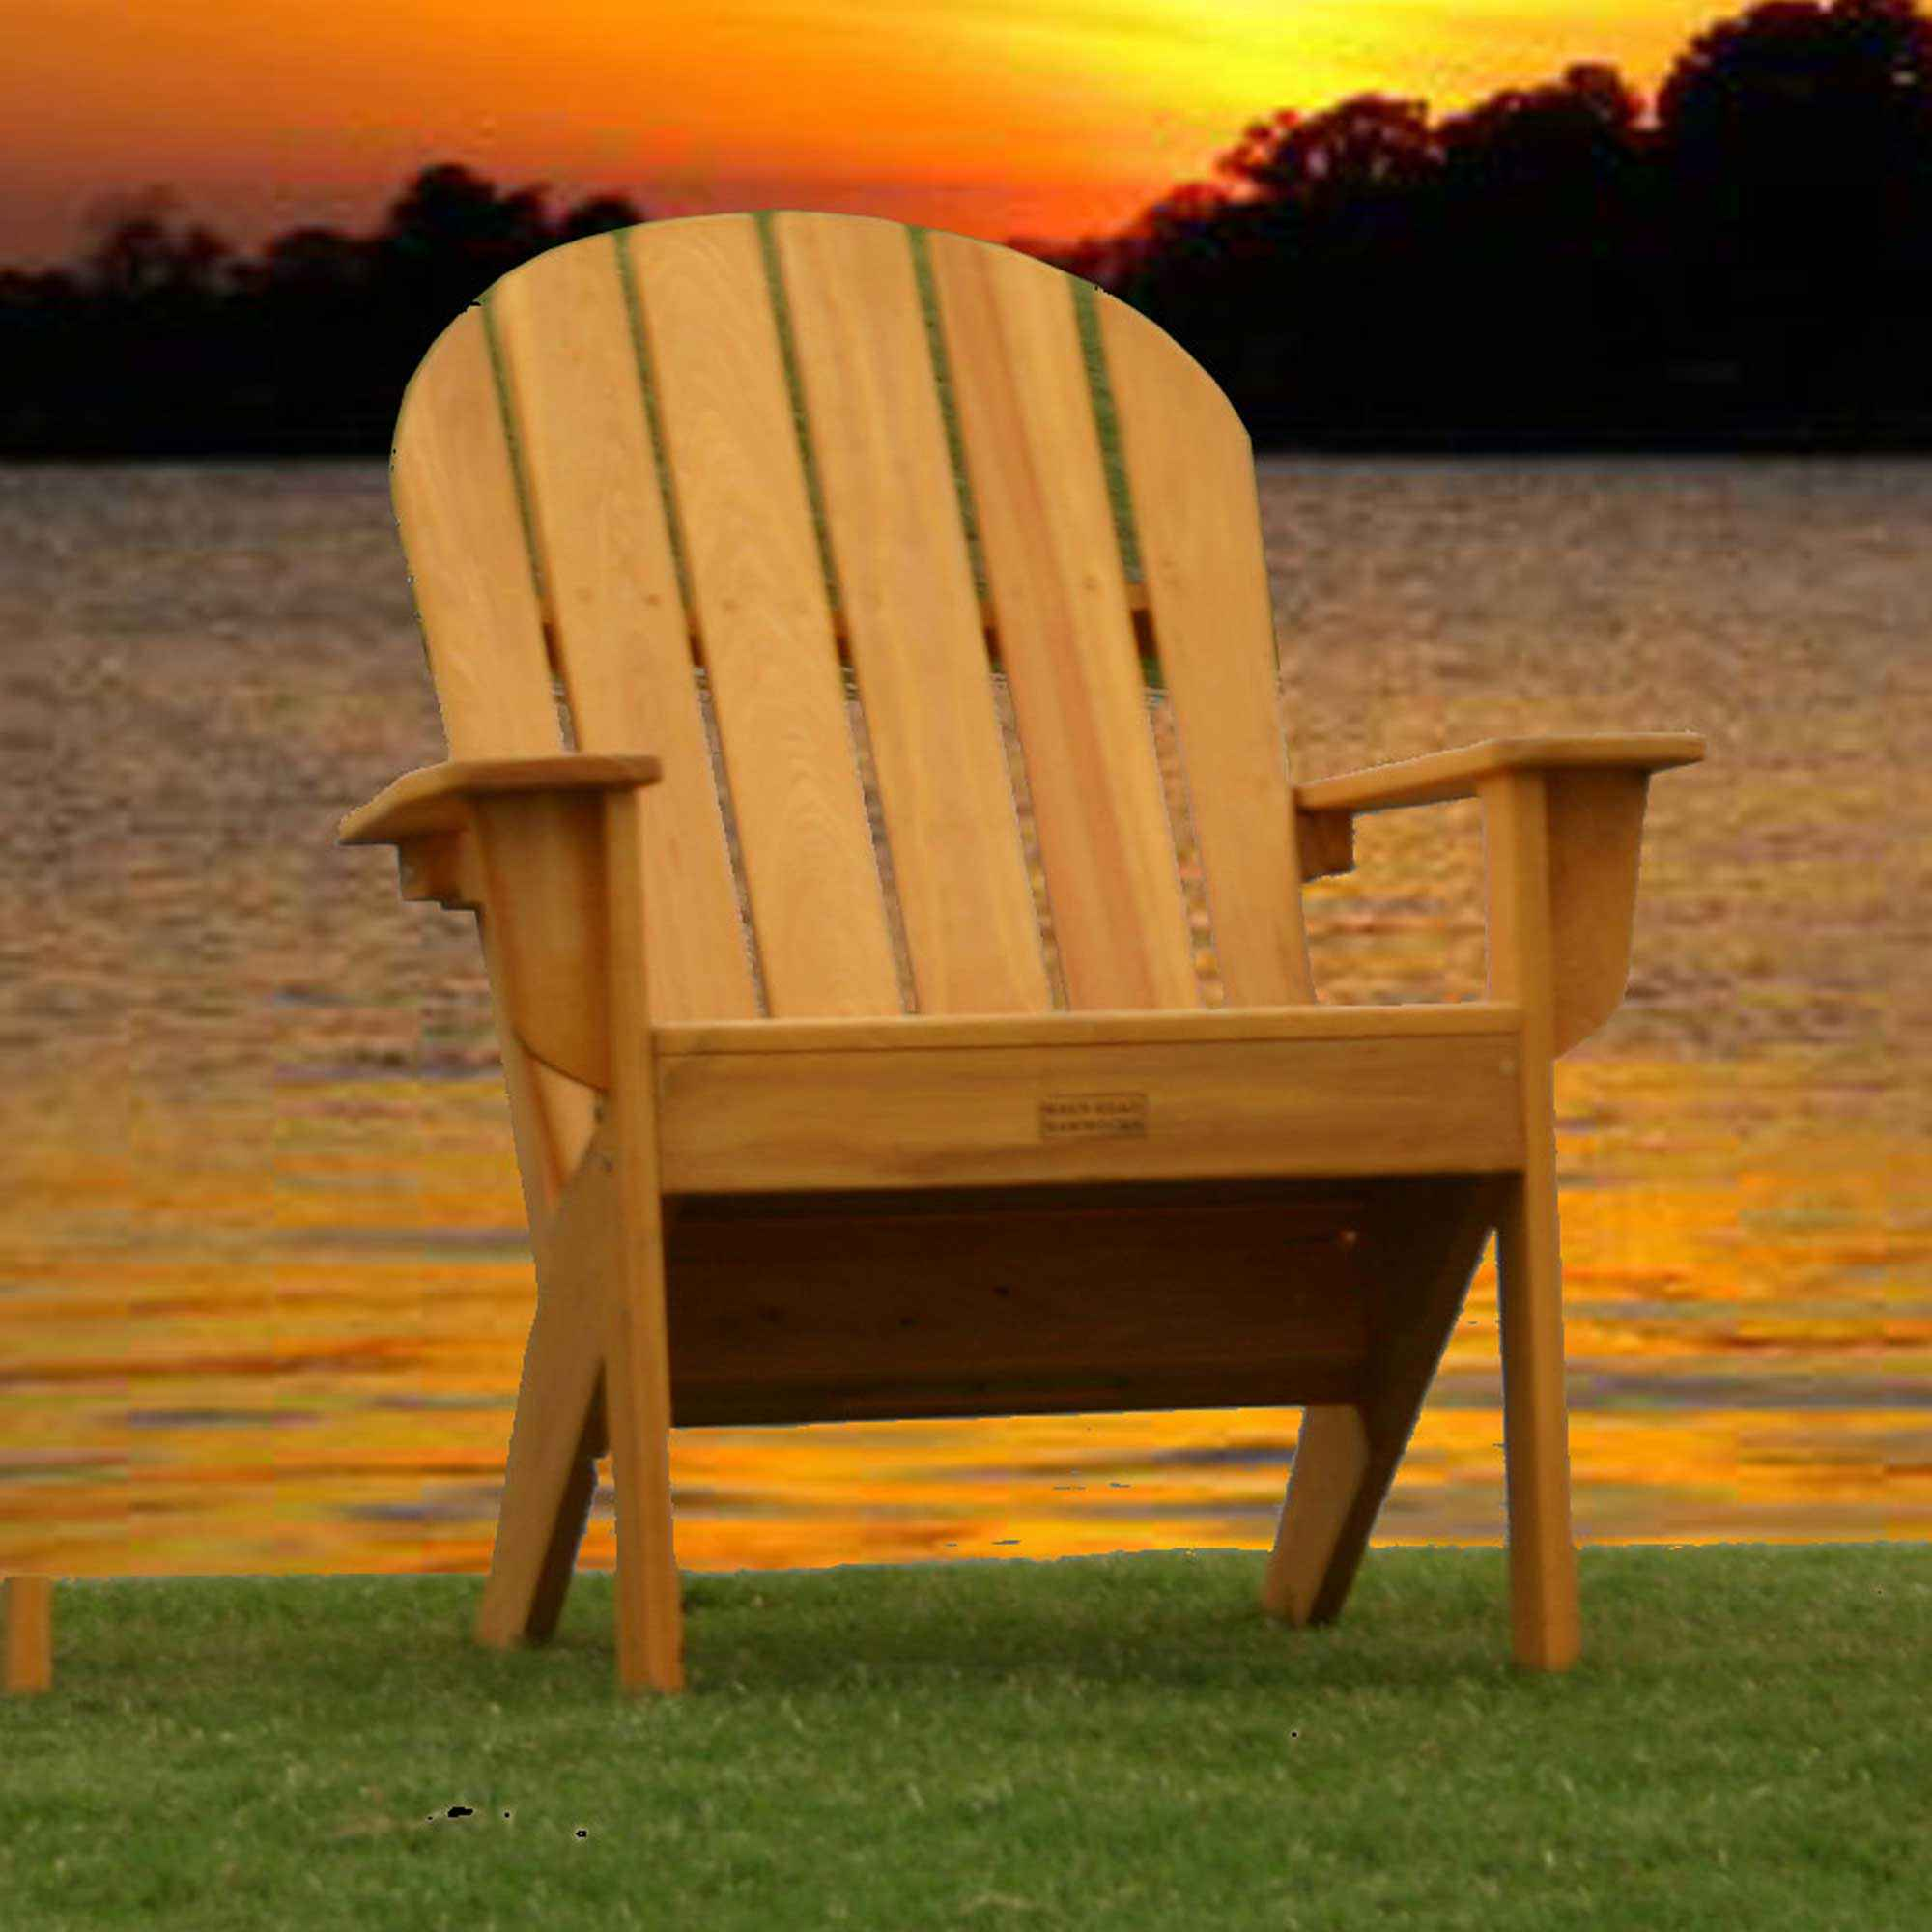 Cypress Adirondack Chair Honey Gold